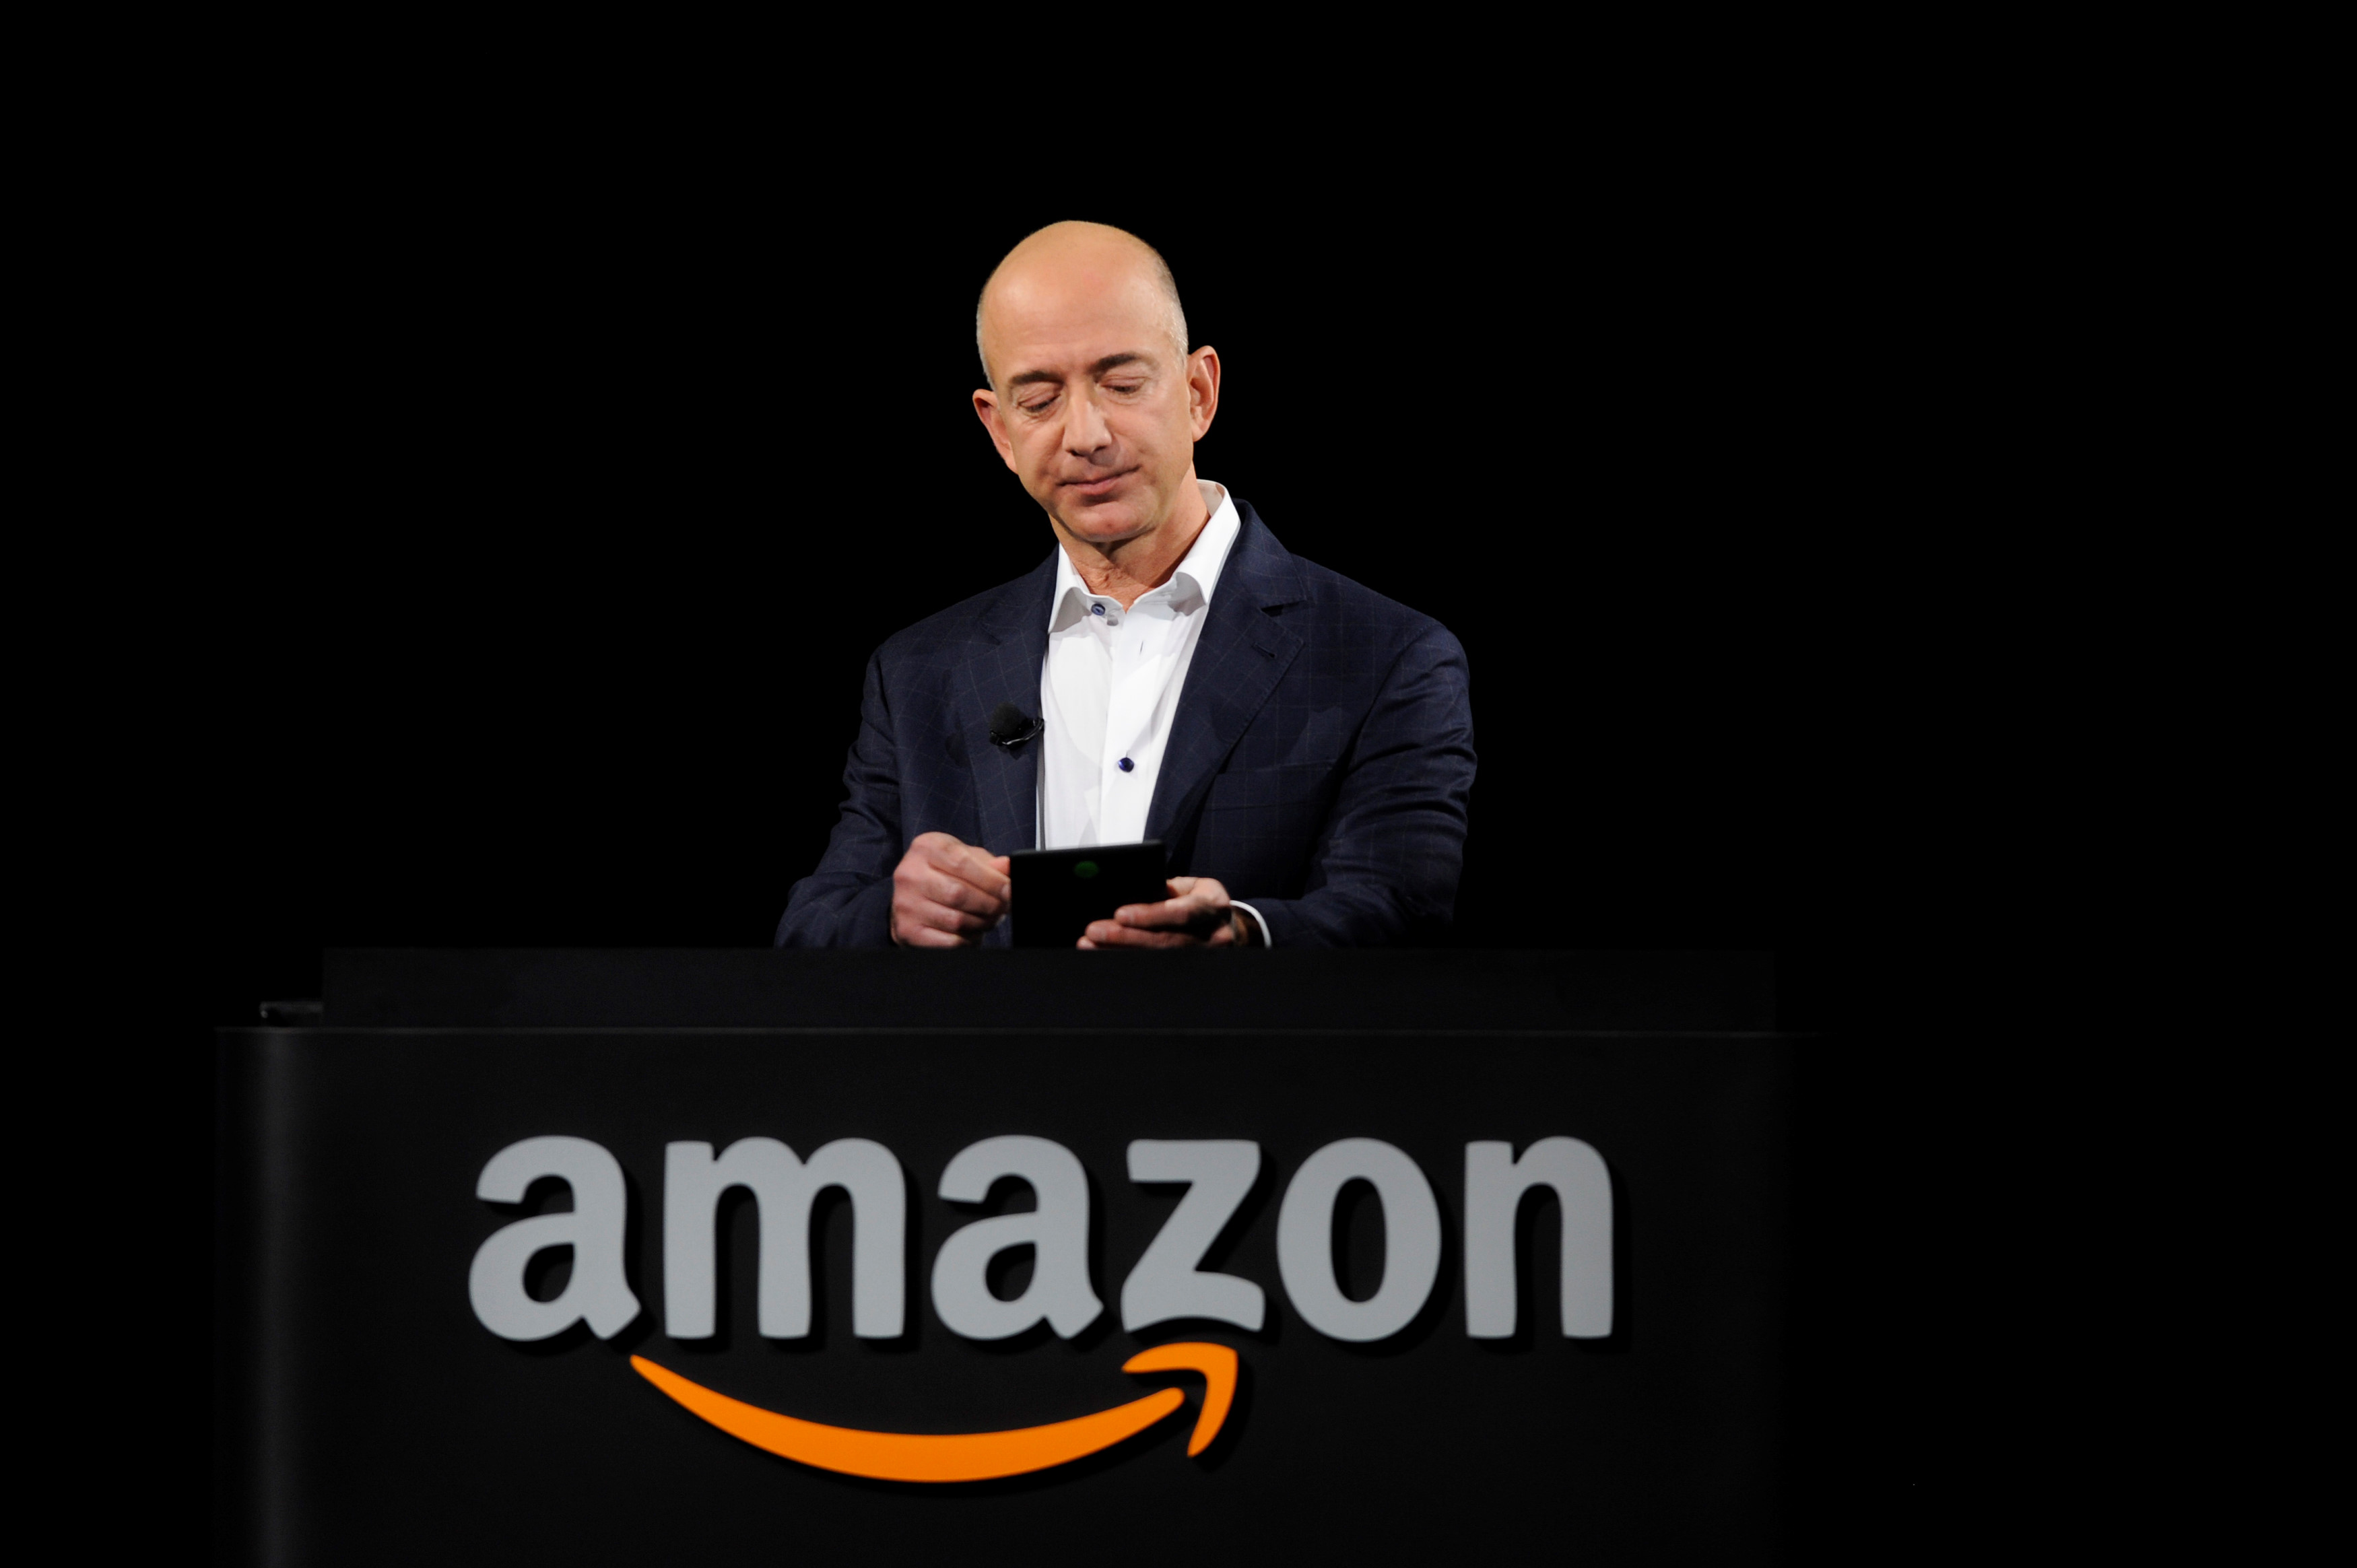 Tỉ phú Jeff Bezos liên tiếp mất tiền vì Amazon Ảnh 1